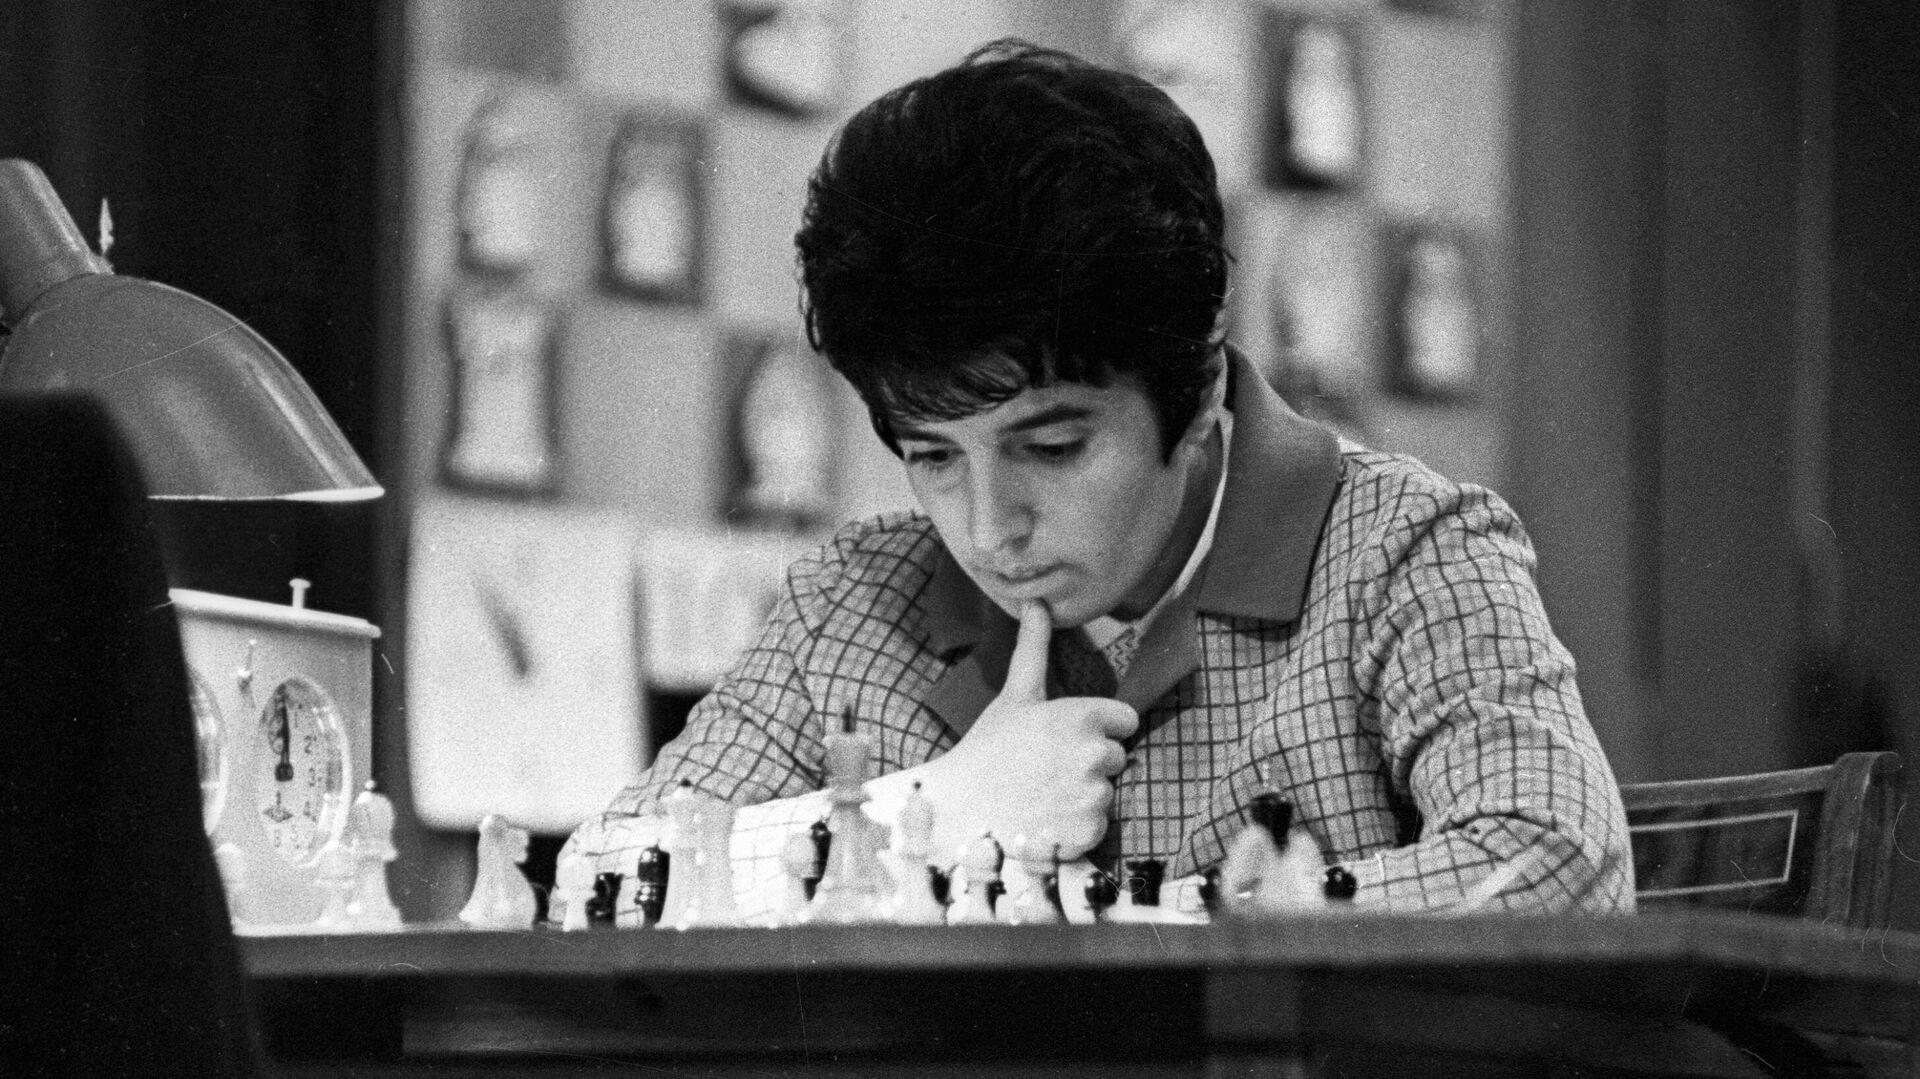 Чемпионка мира по шахматам Нона Гаприндашвили. - Sputnik Беларусь, 1920, 17.09.2021